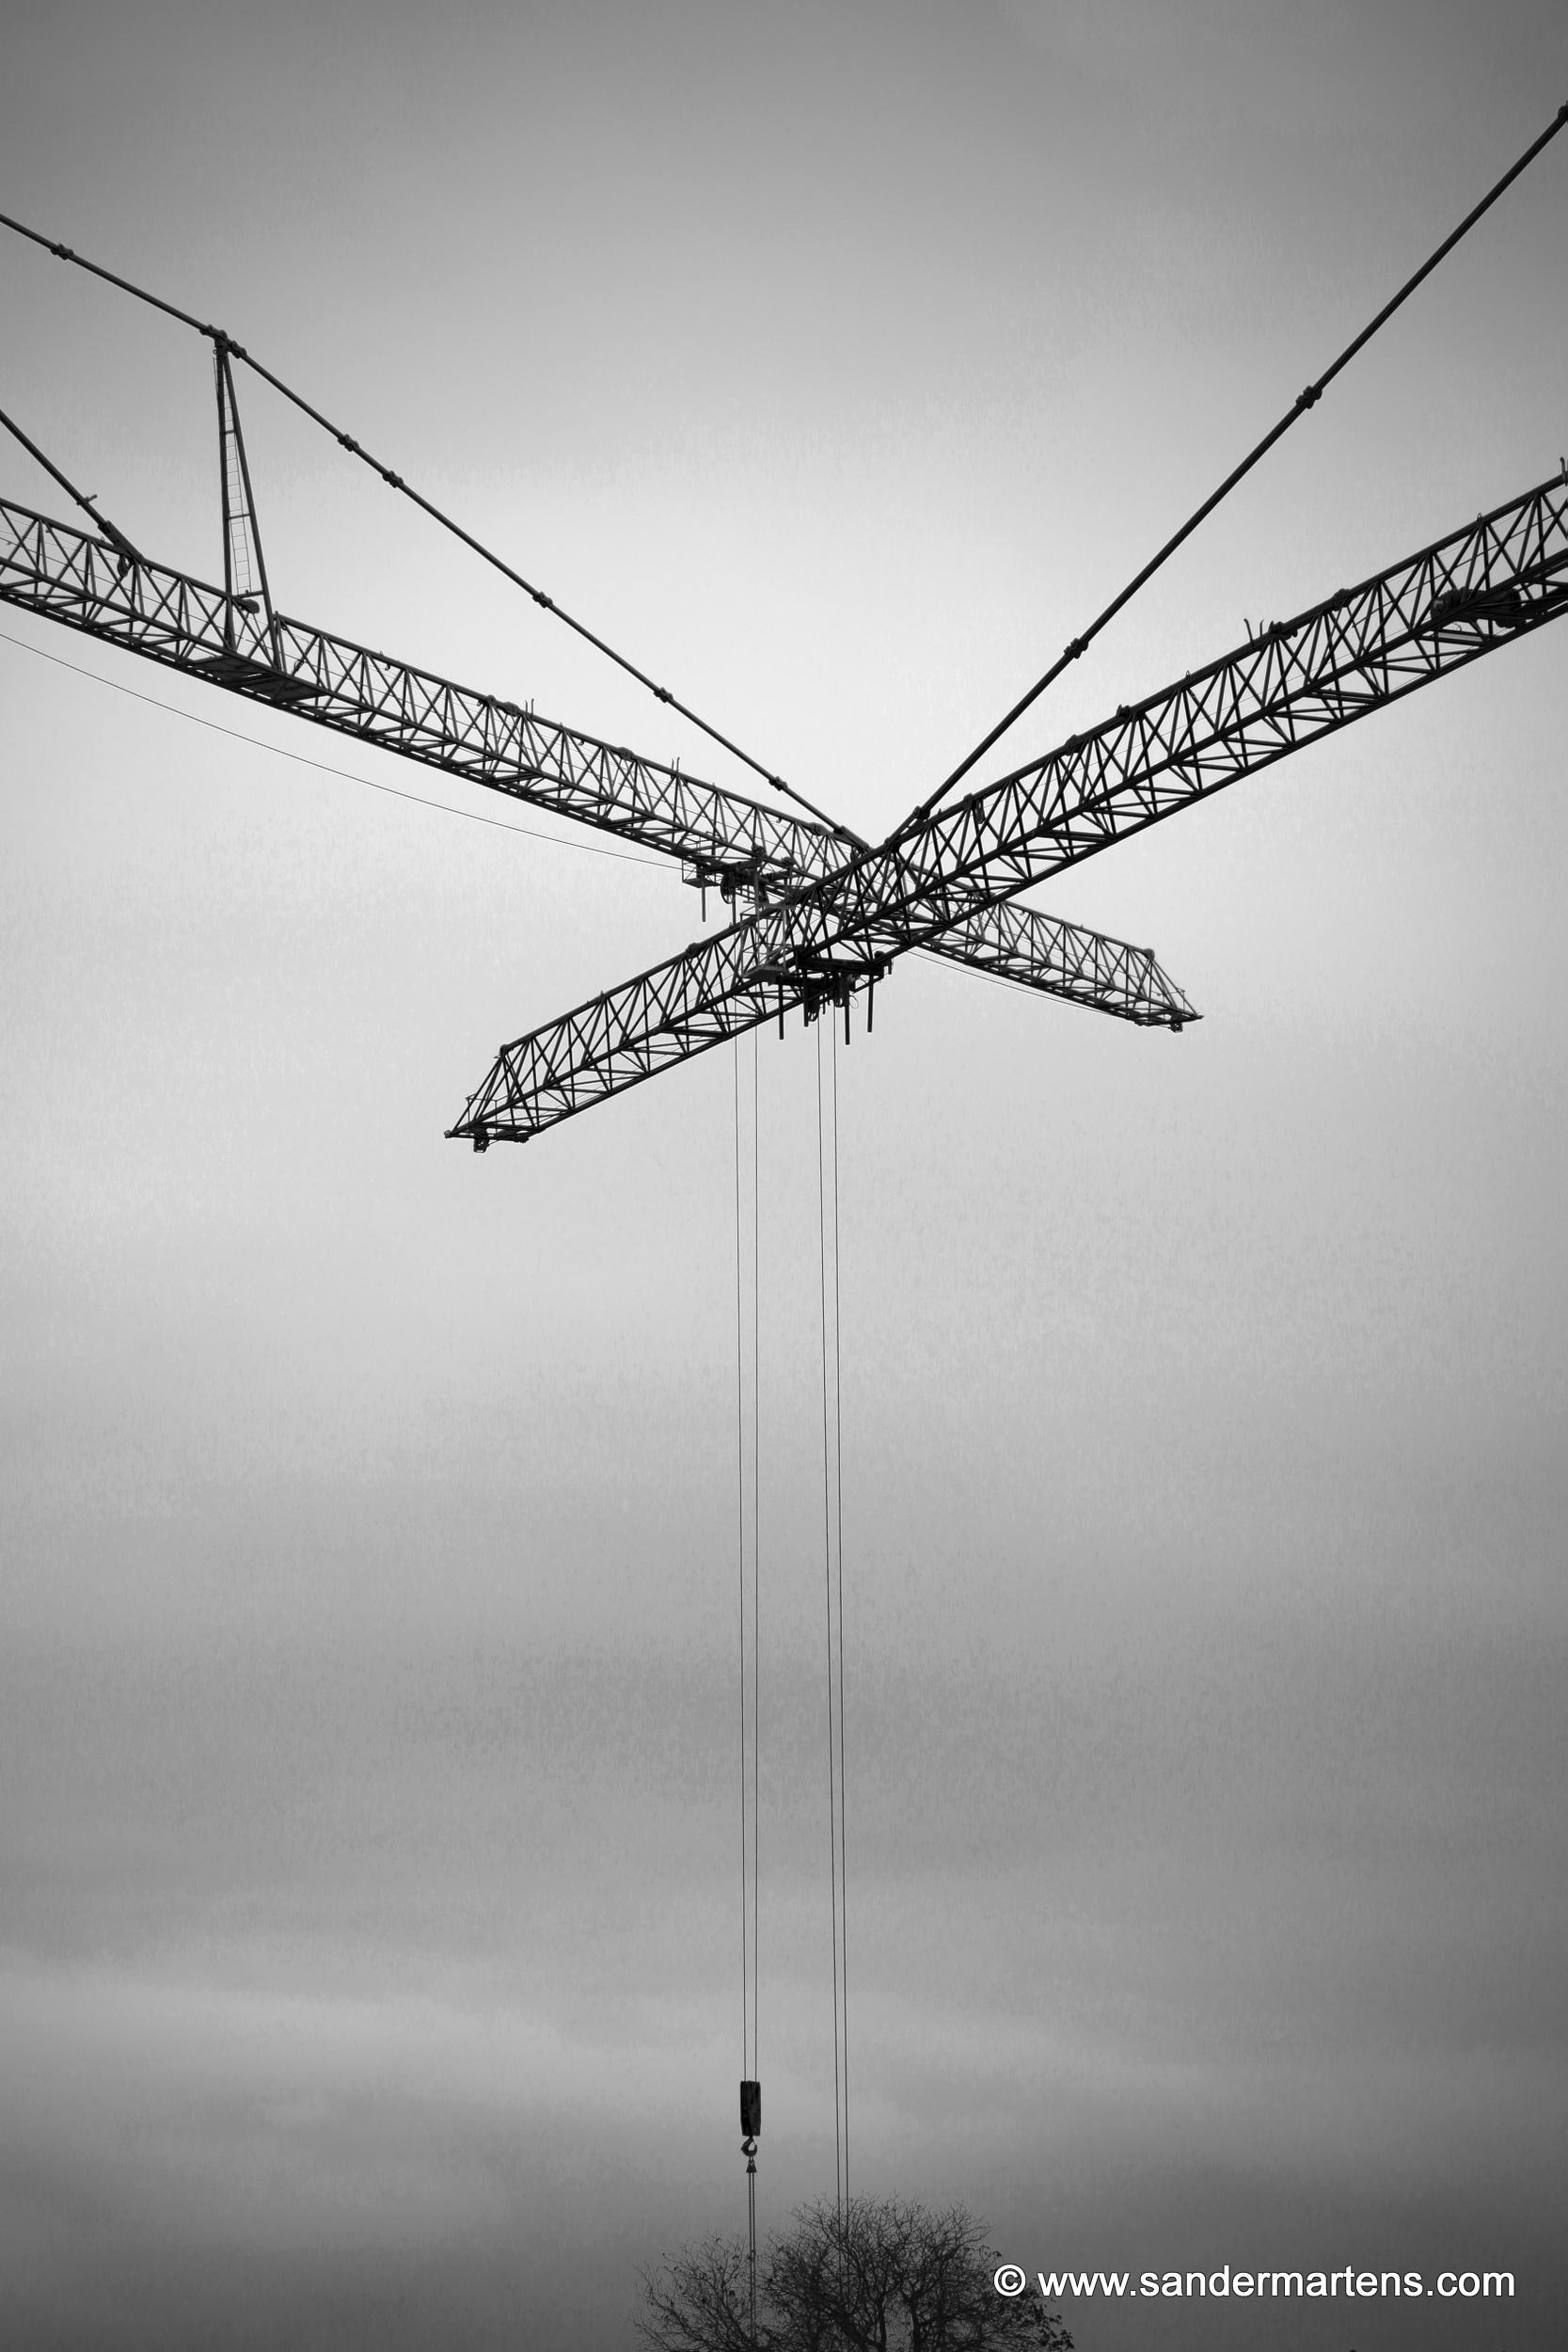 Inspired by Henri Cartier-Bresson